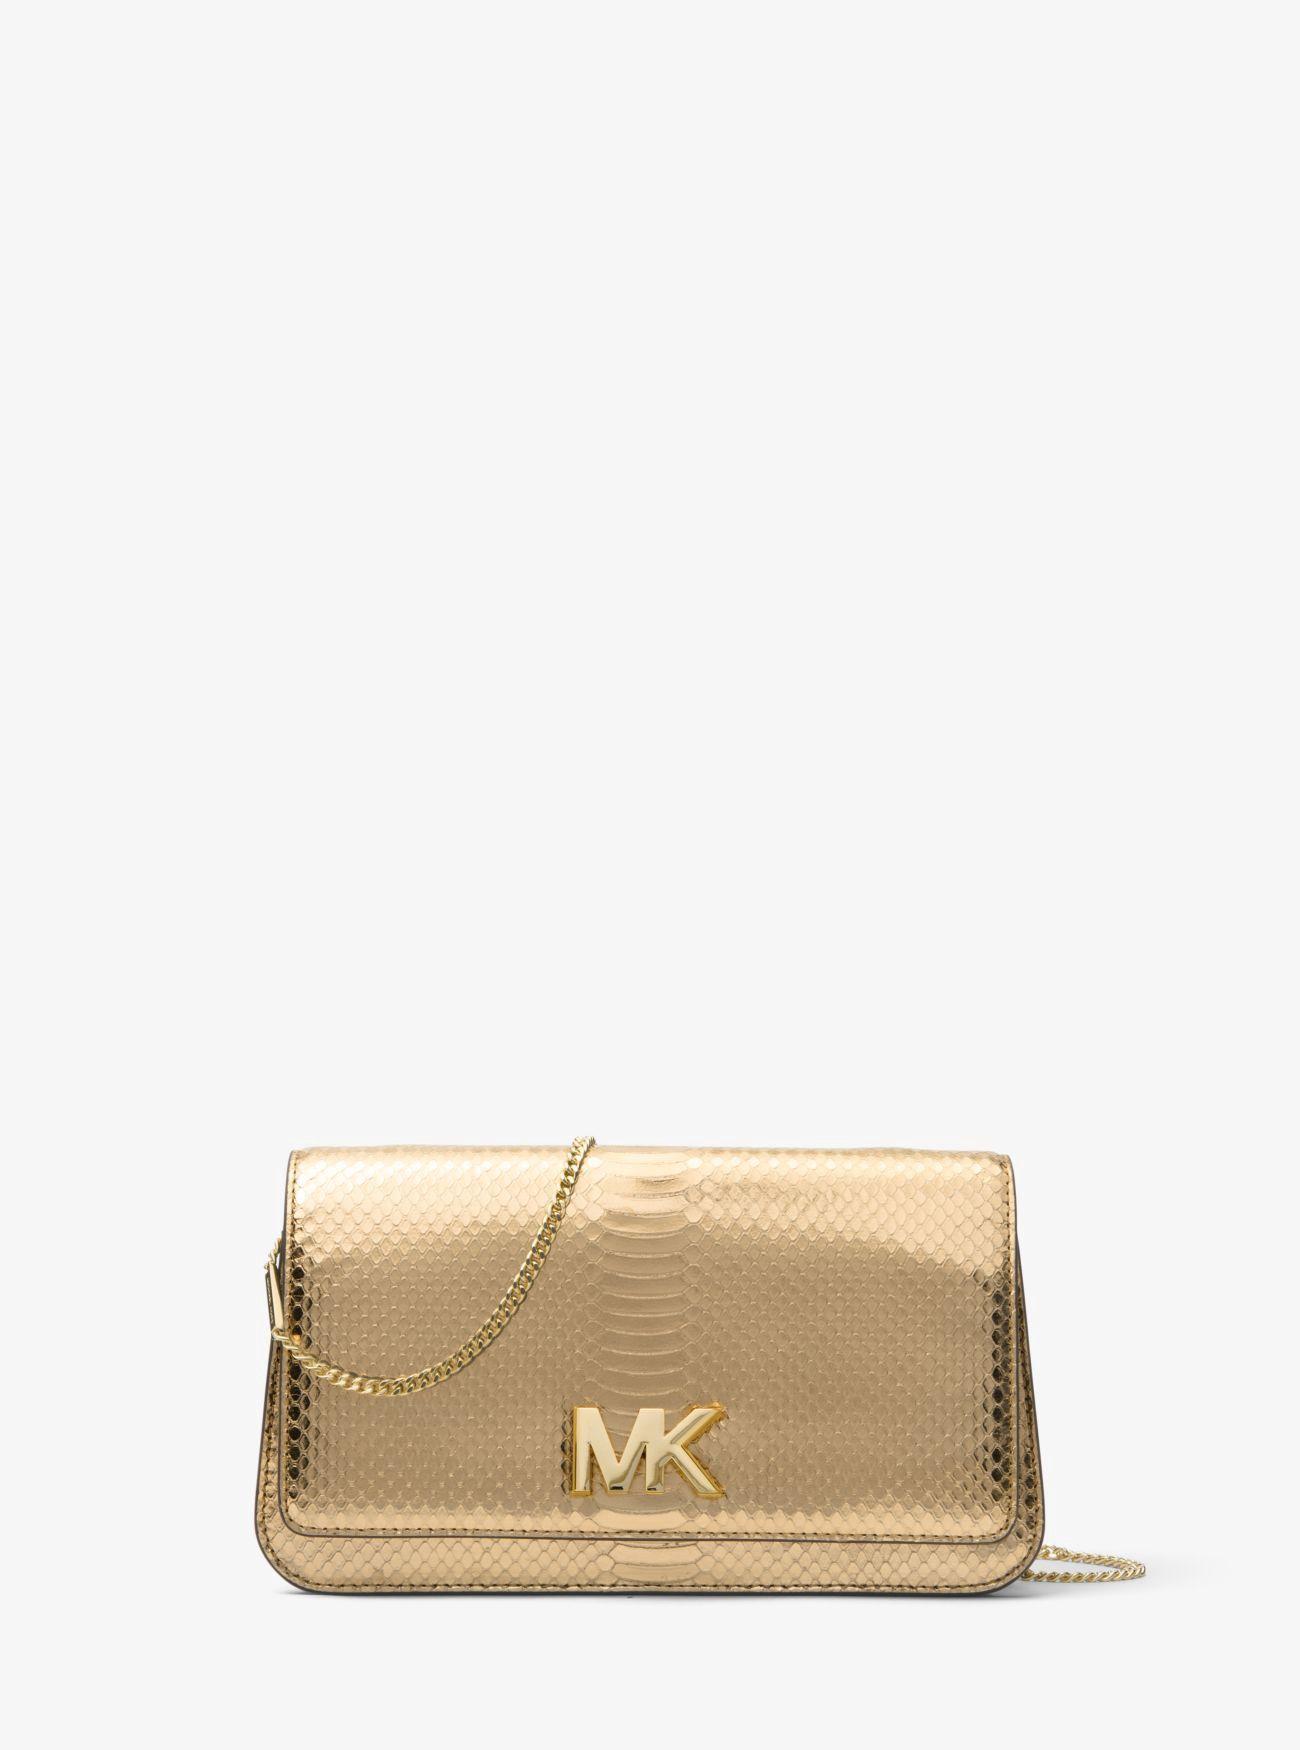 d15baedaa0867b MICHAEL KORS Mott Large Metallic Embossed-Leather Clutch. #michaelkors #bags  #polyester #leather #clutch #metallic #shoulder bags #lining #hand bags #